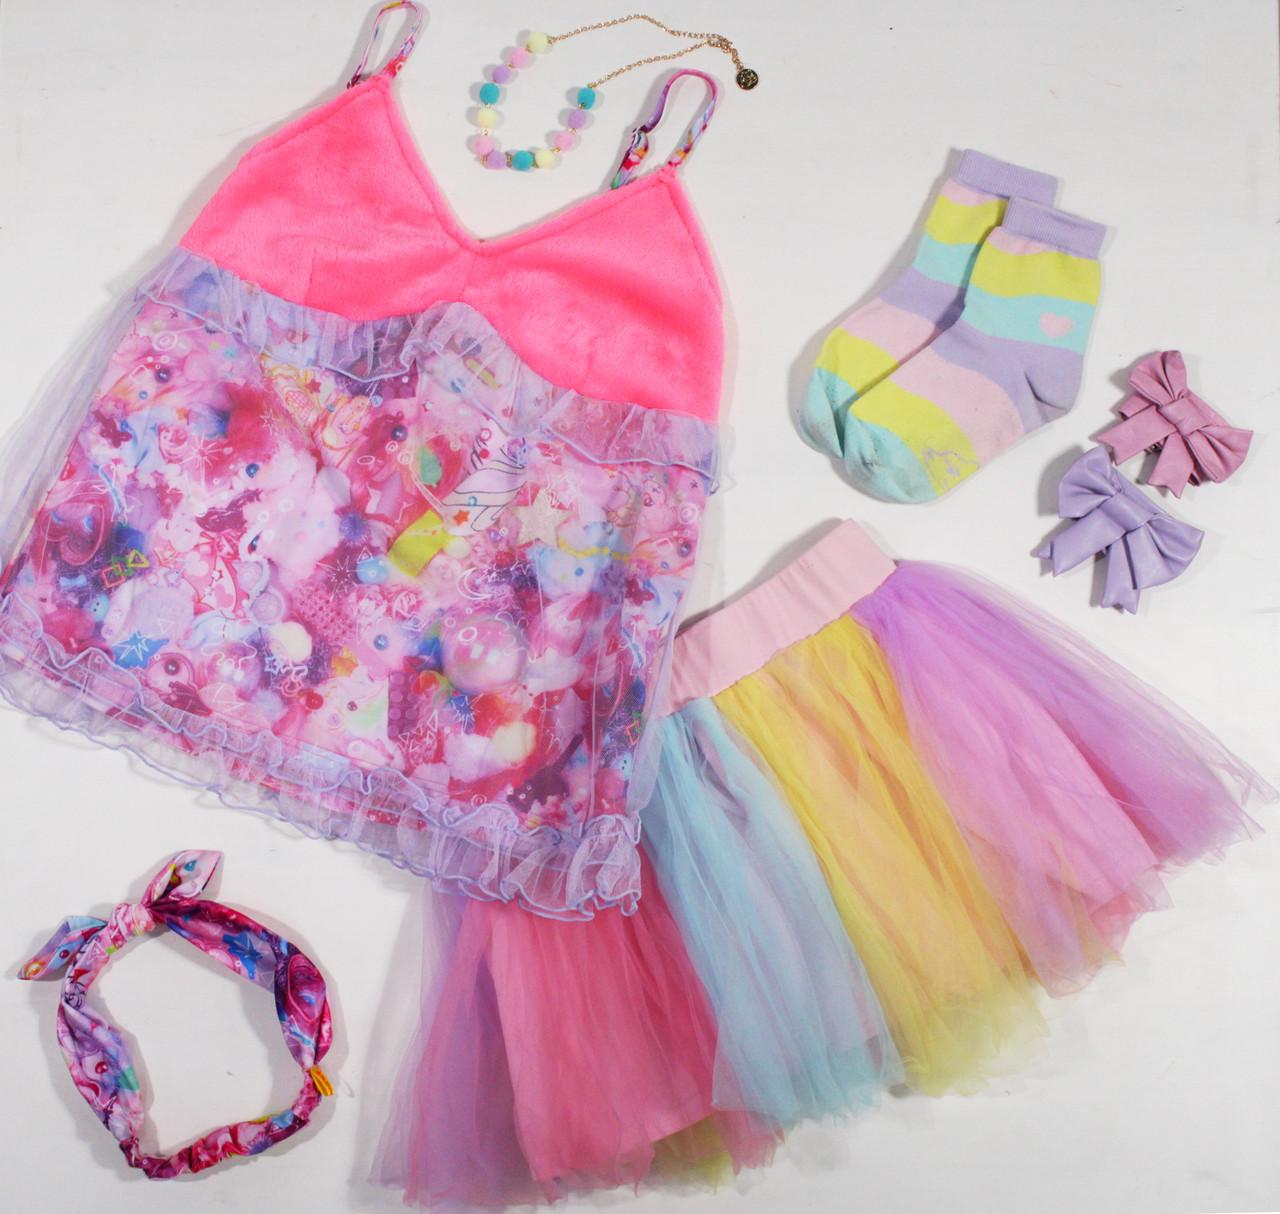 Top: Babydoll Camisole Skirt: Pompoji's Cotton Candy Skirt Headband: Ribbon Hairband Socks: Candy Stripe Socks Bracelet: Charming Bow Bracelets Necklace: Bubblegum Ball Necklace  6DOKIDOKI x GHOST GiRL GOODS